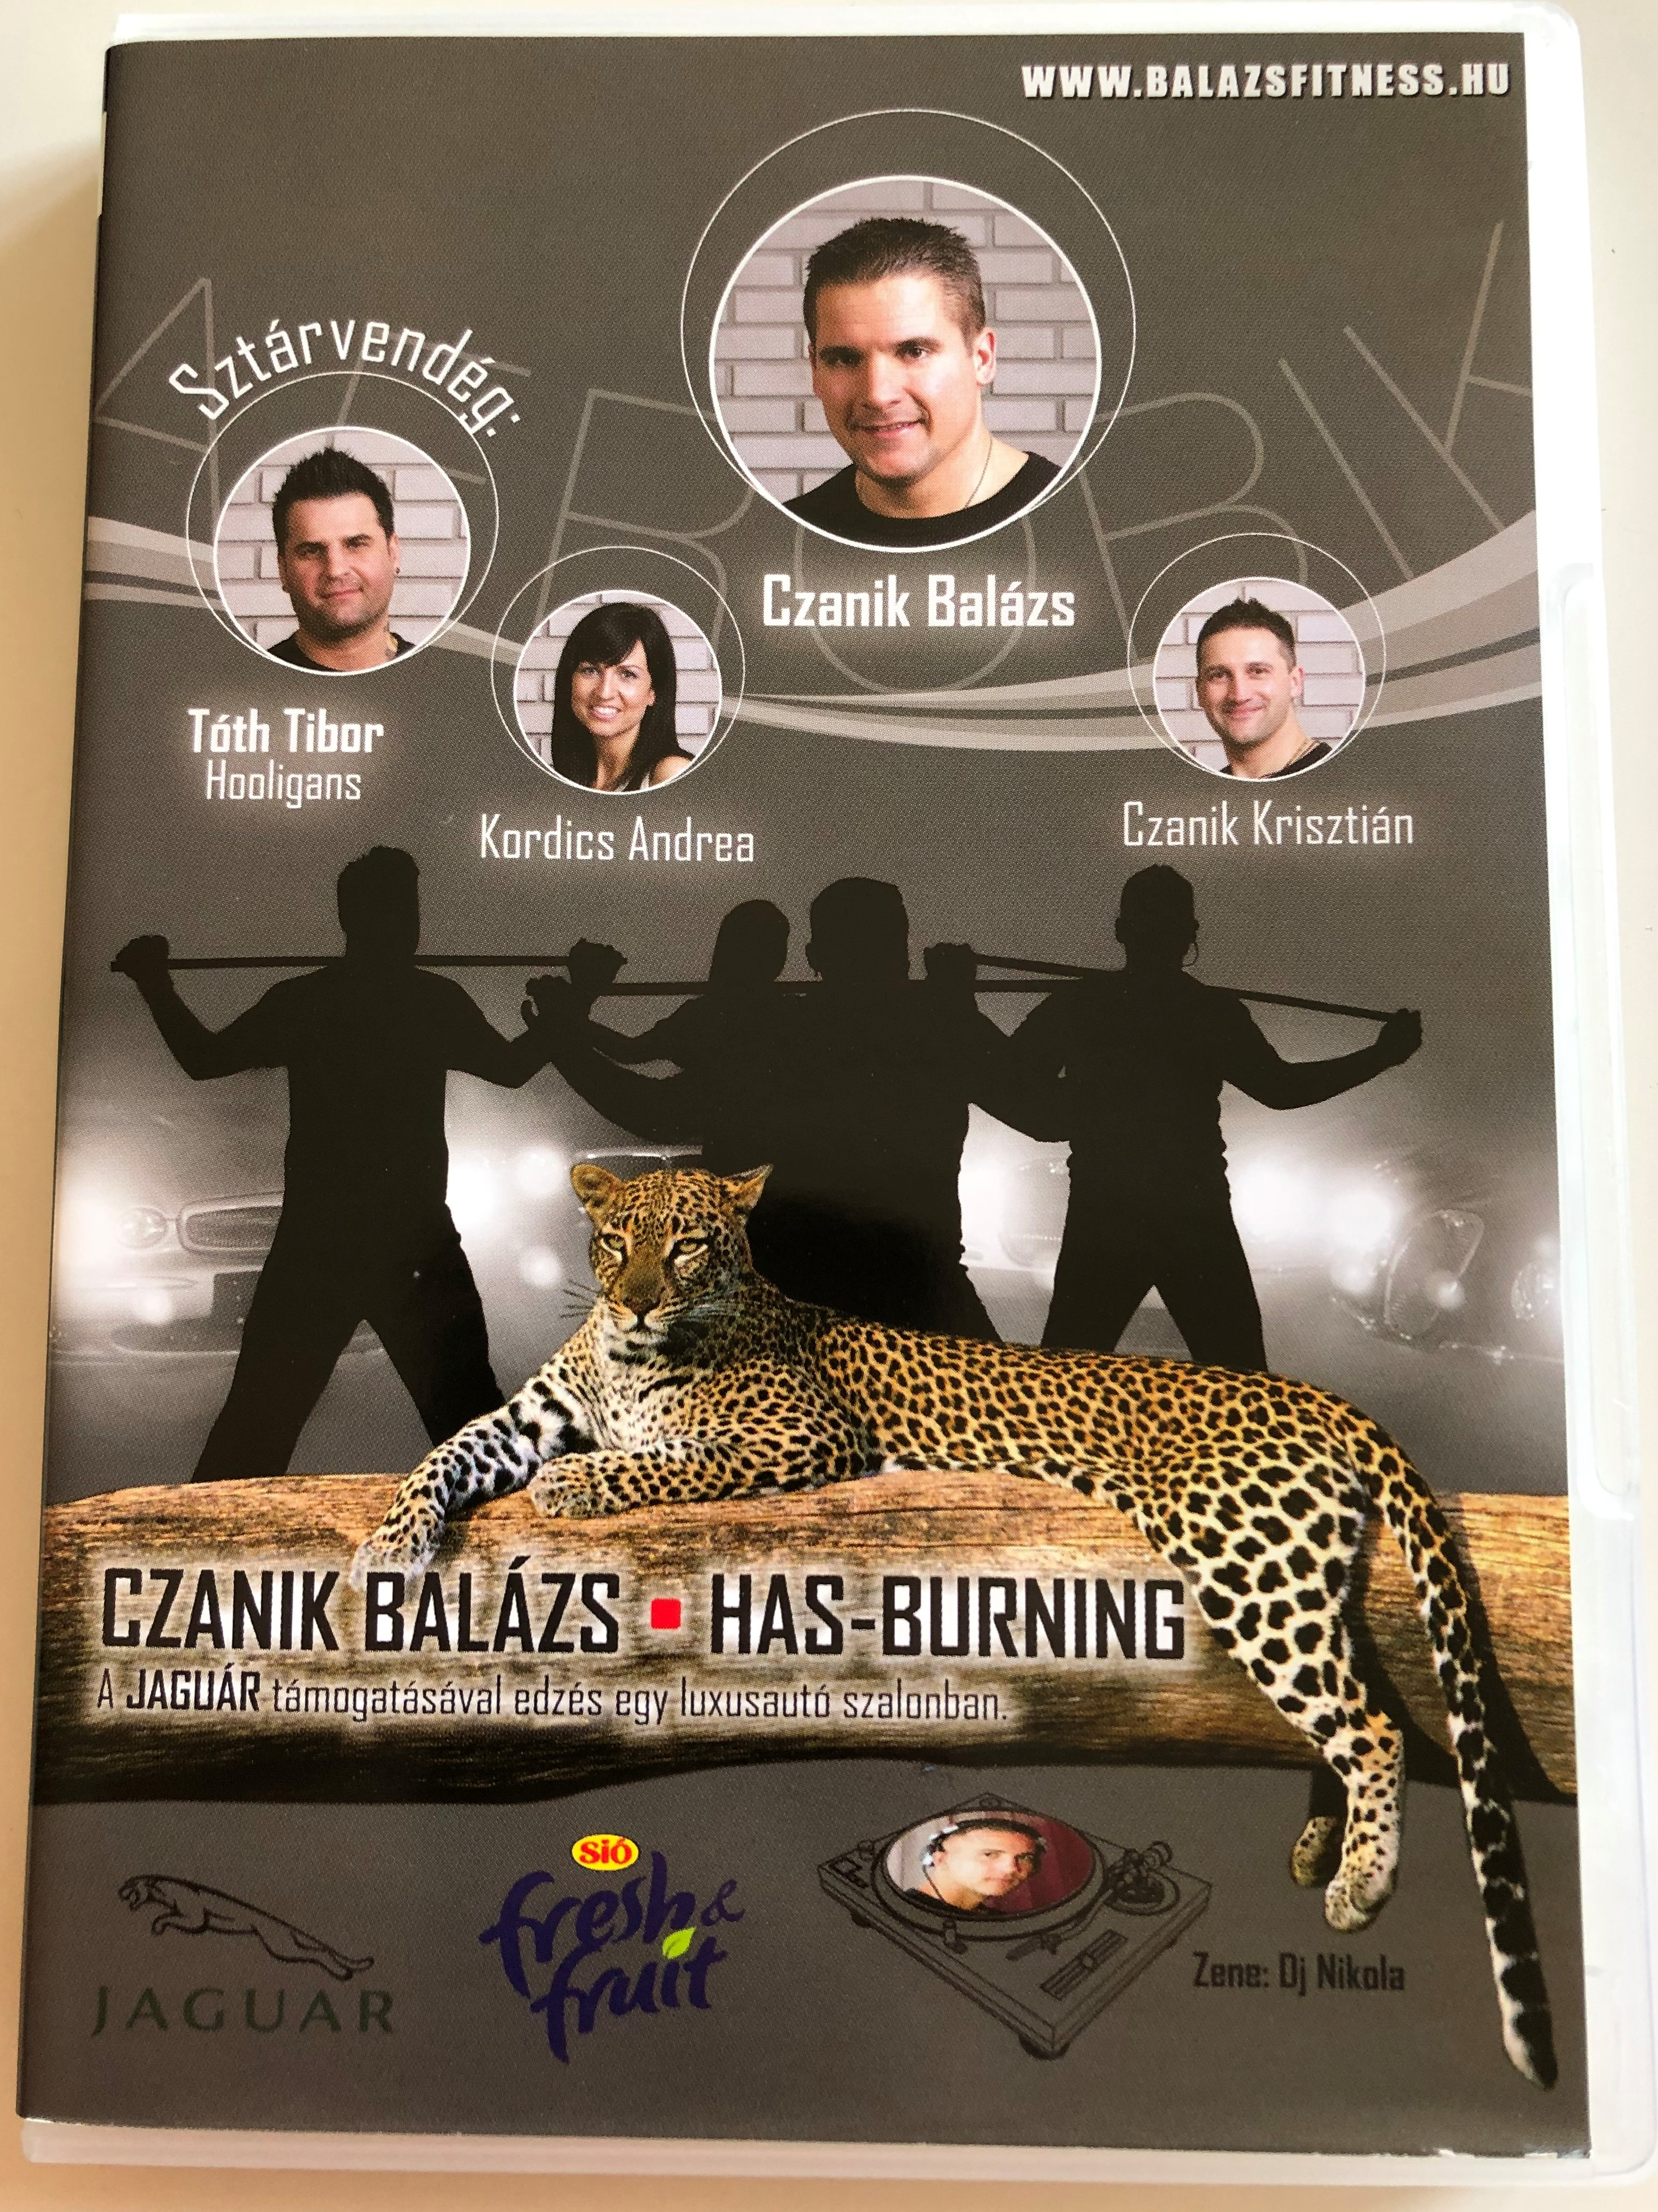 -has-burning-dvd-2018-body-building-aerobic-movie-with-czanik-bal-zs-directed-by-szentgy-rgyi-g-za-1-.jpg